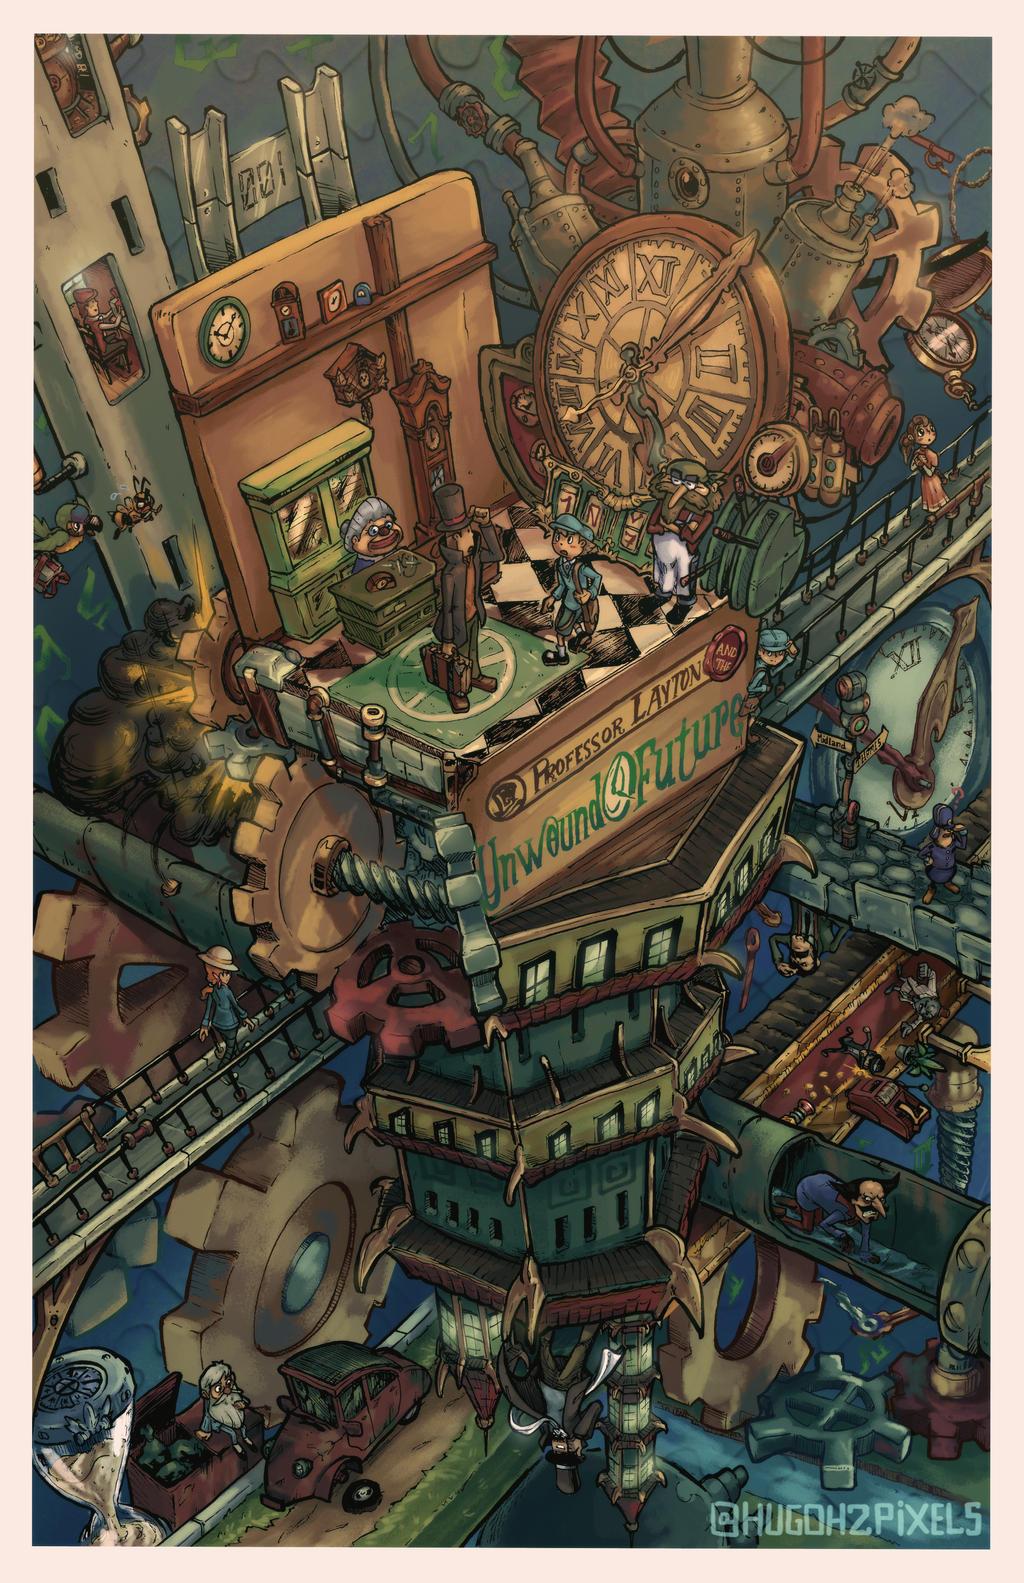 Isometric Nostalgia: Prof. Layton - Unwound Future